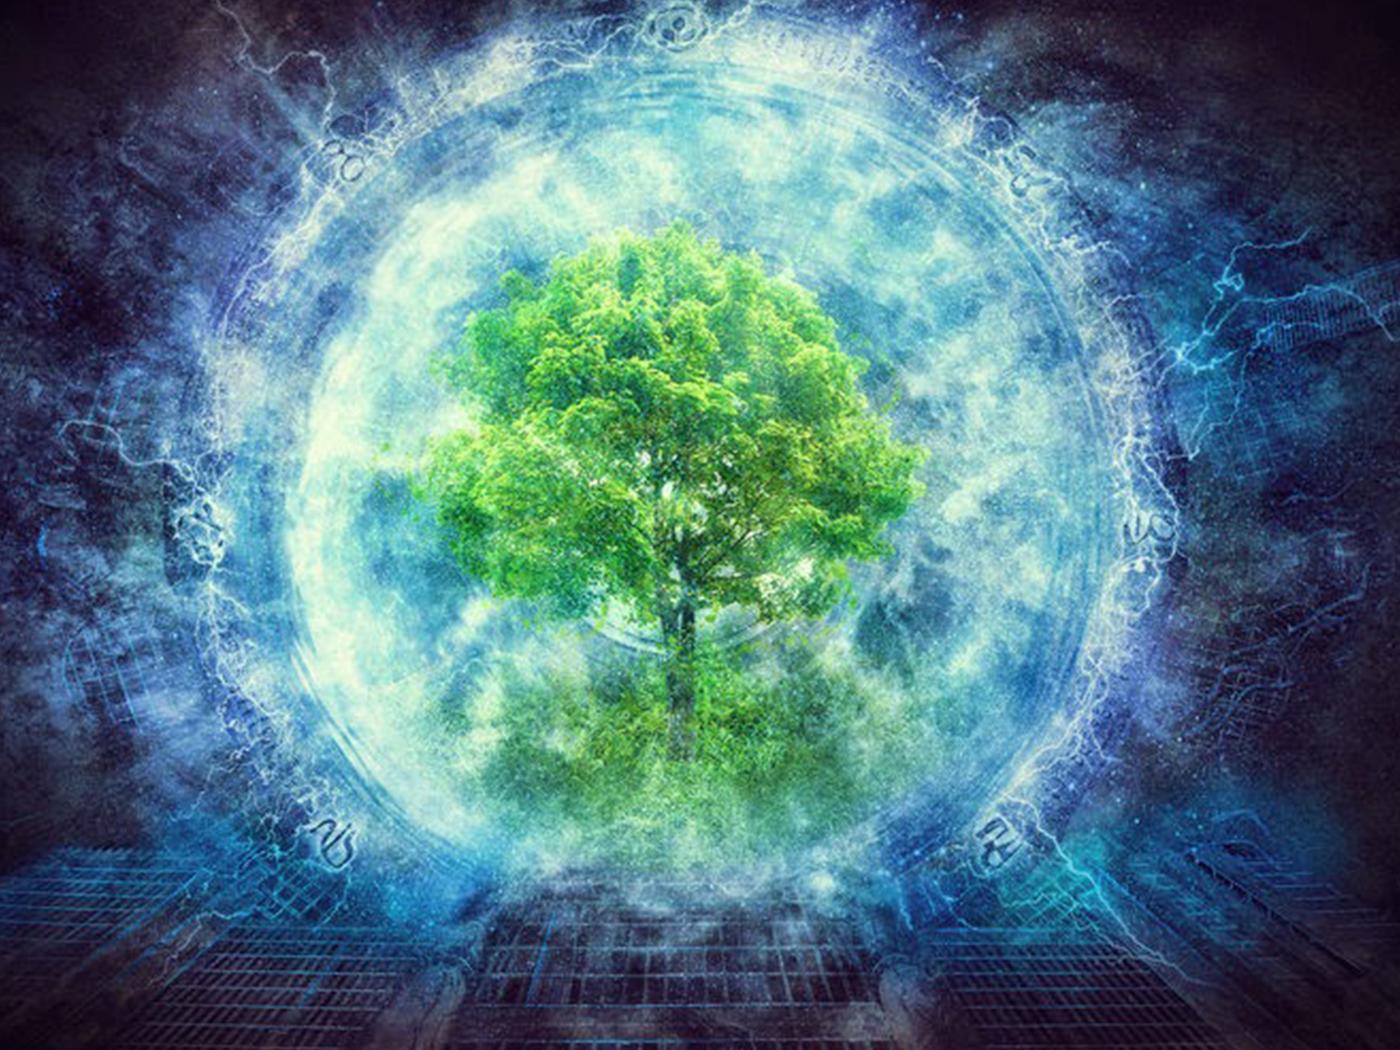 Evolutionists Sense Life's Design and Deify Nature